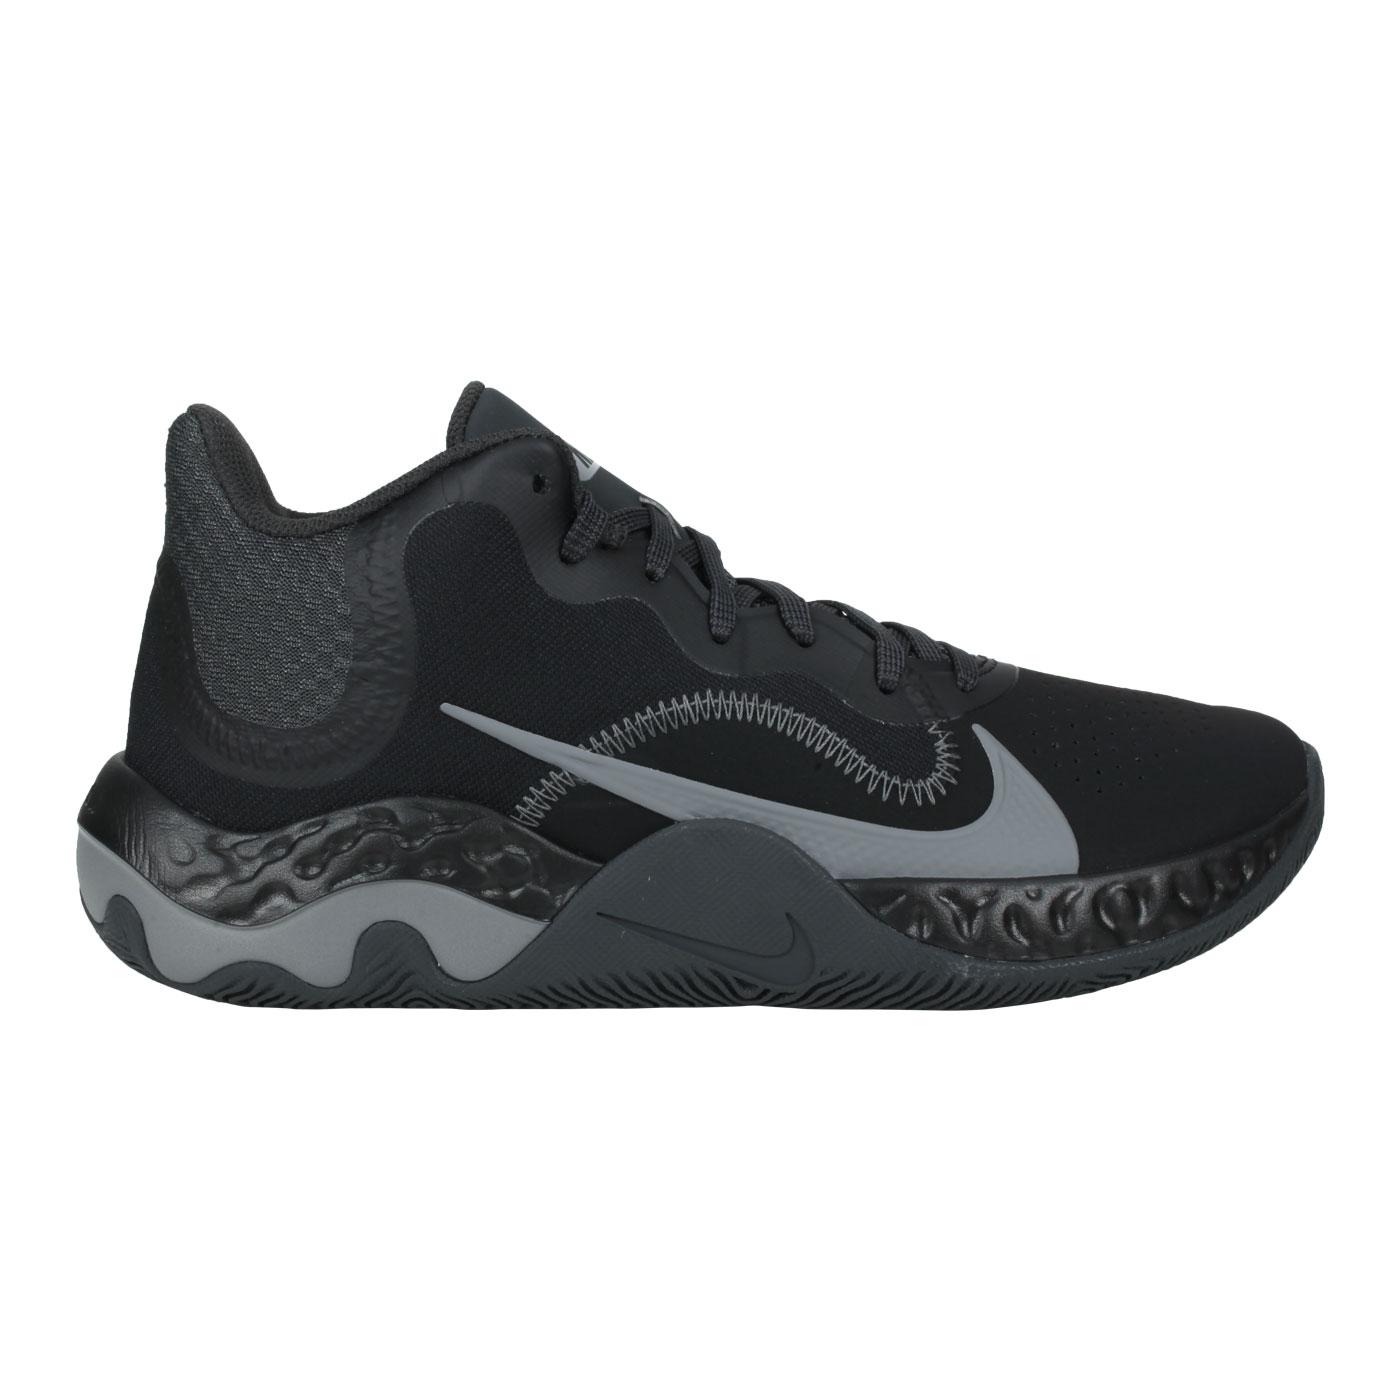 NIKE 男款籃球鞋  @RENEW ELEVATE NBK@CK2670001 - 黑灰